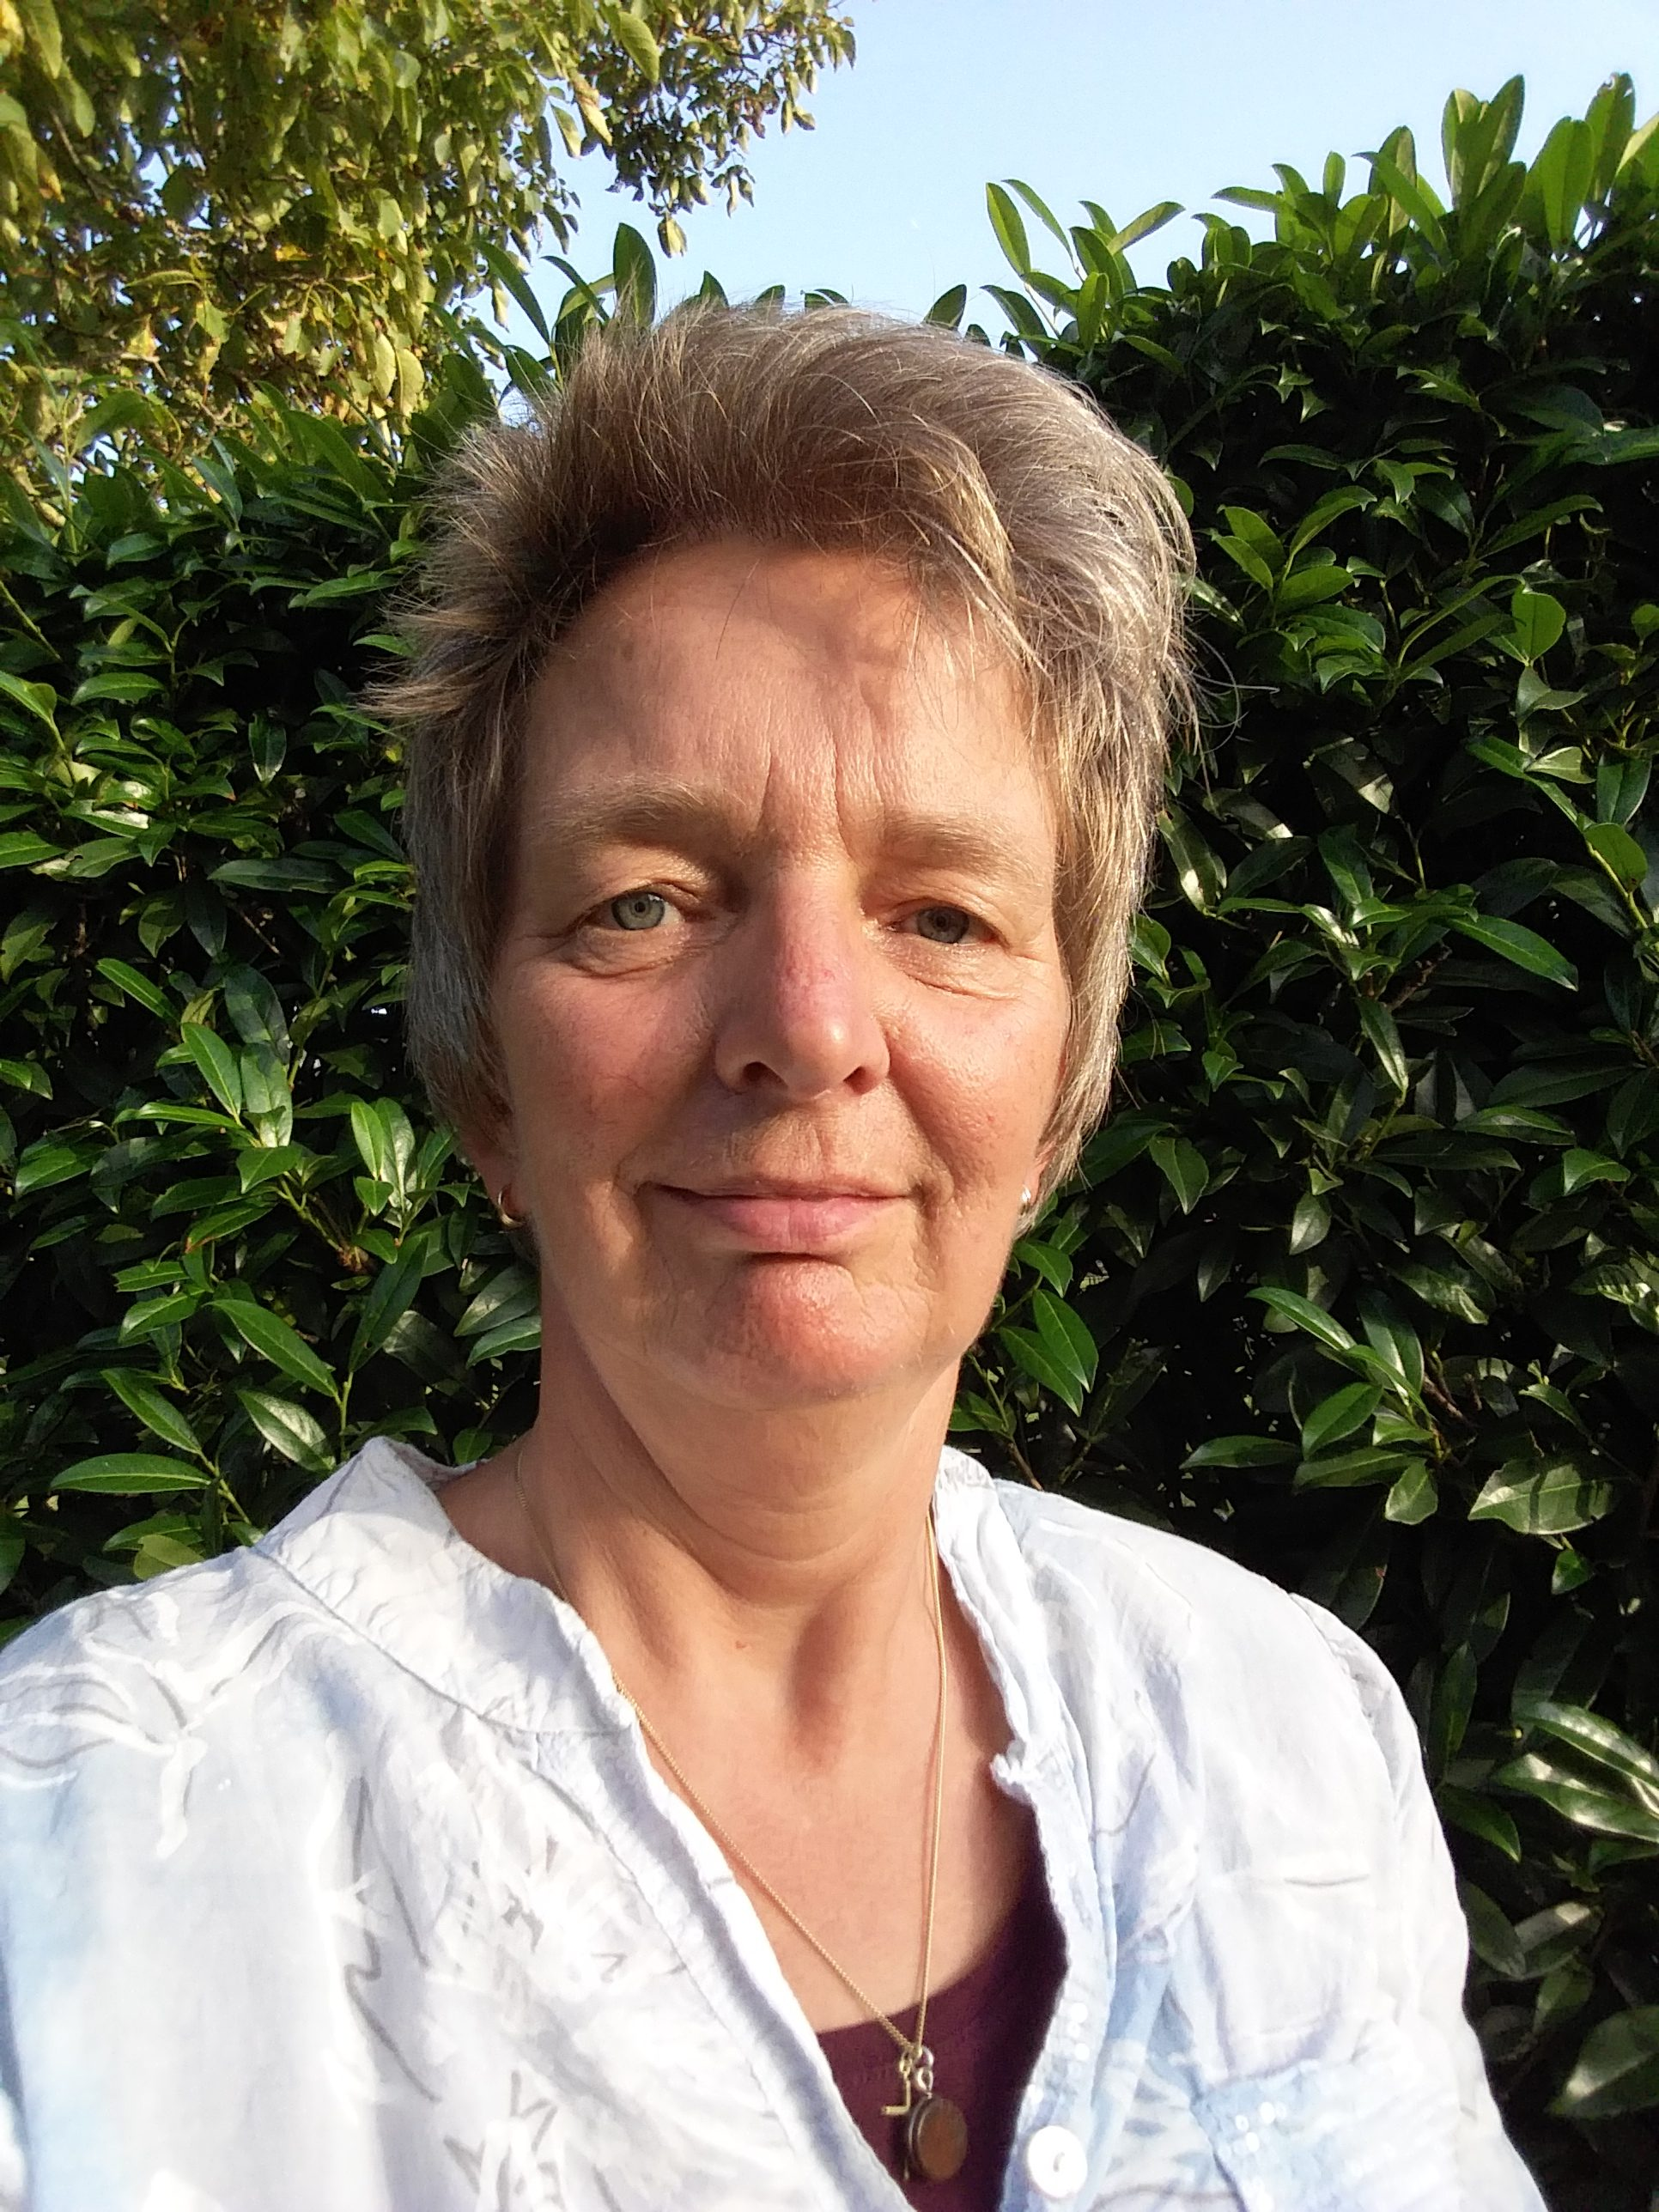 Hanneke Westland